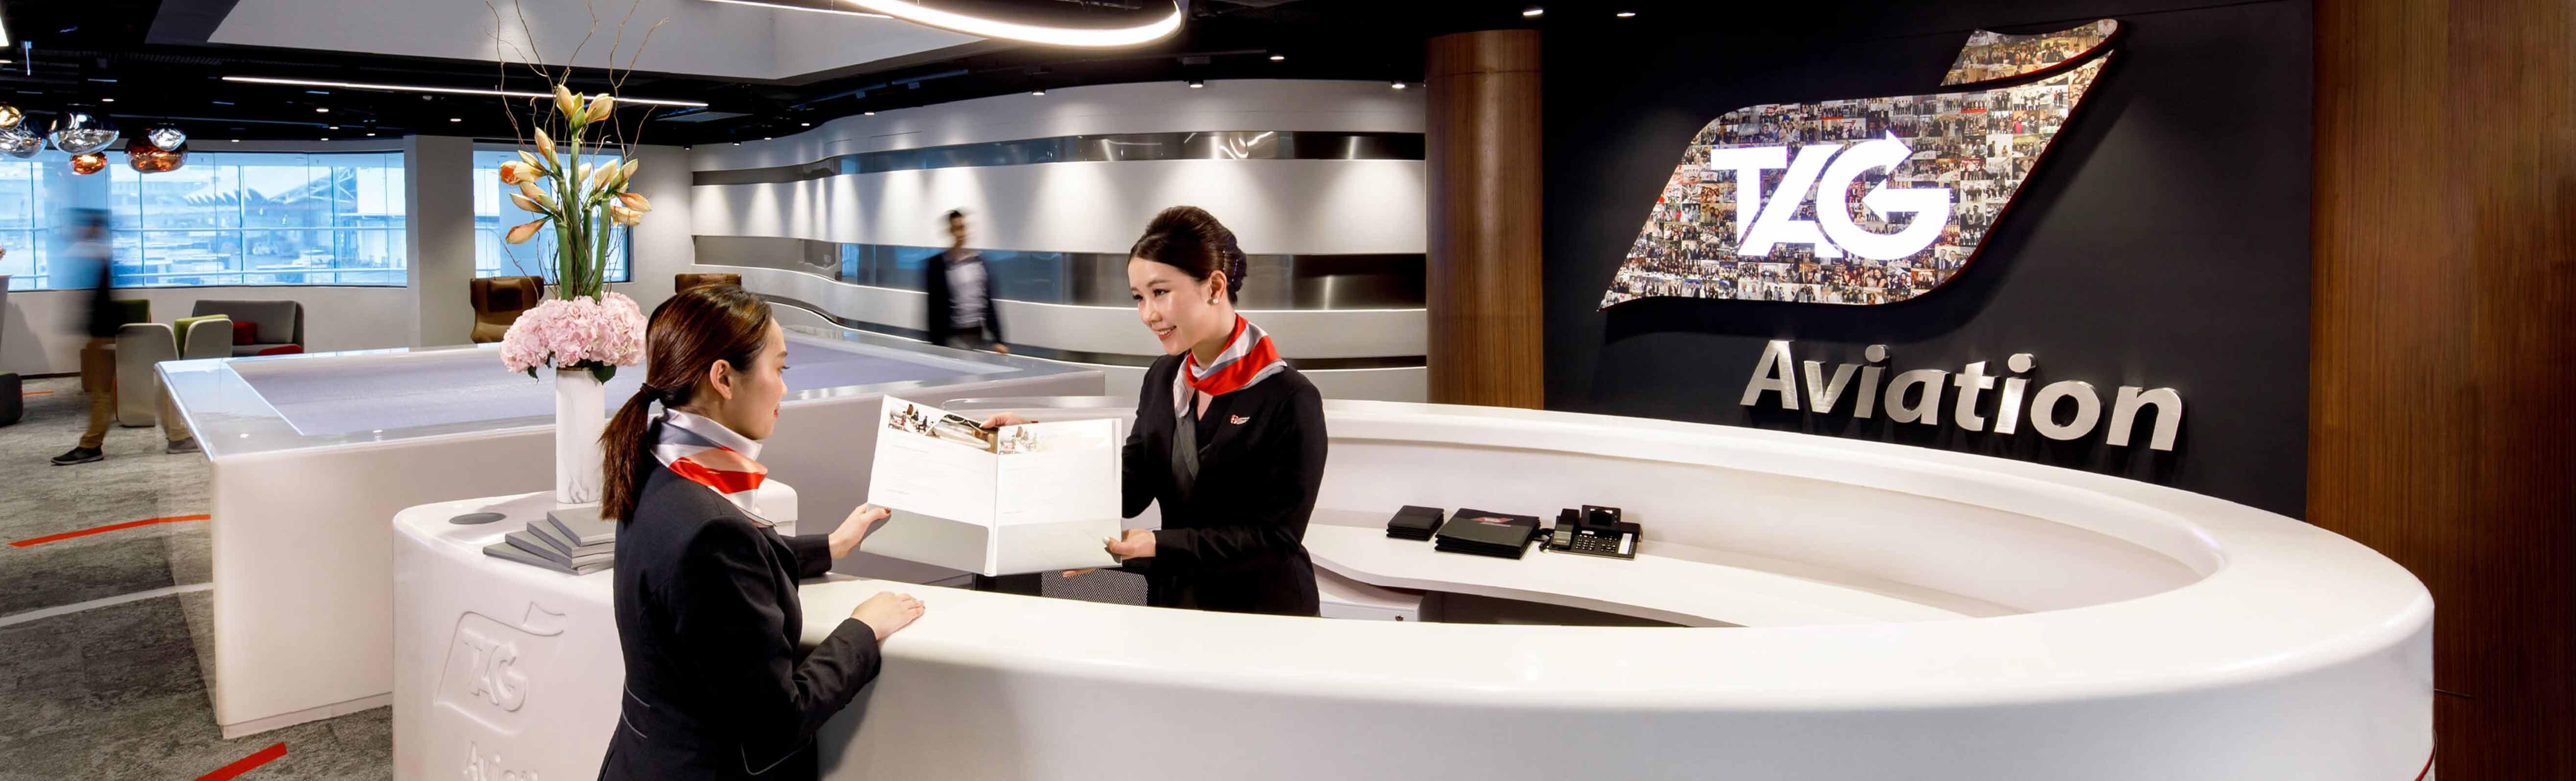 TAG航空亞洲將在澳門開設FBO